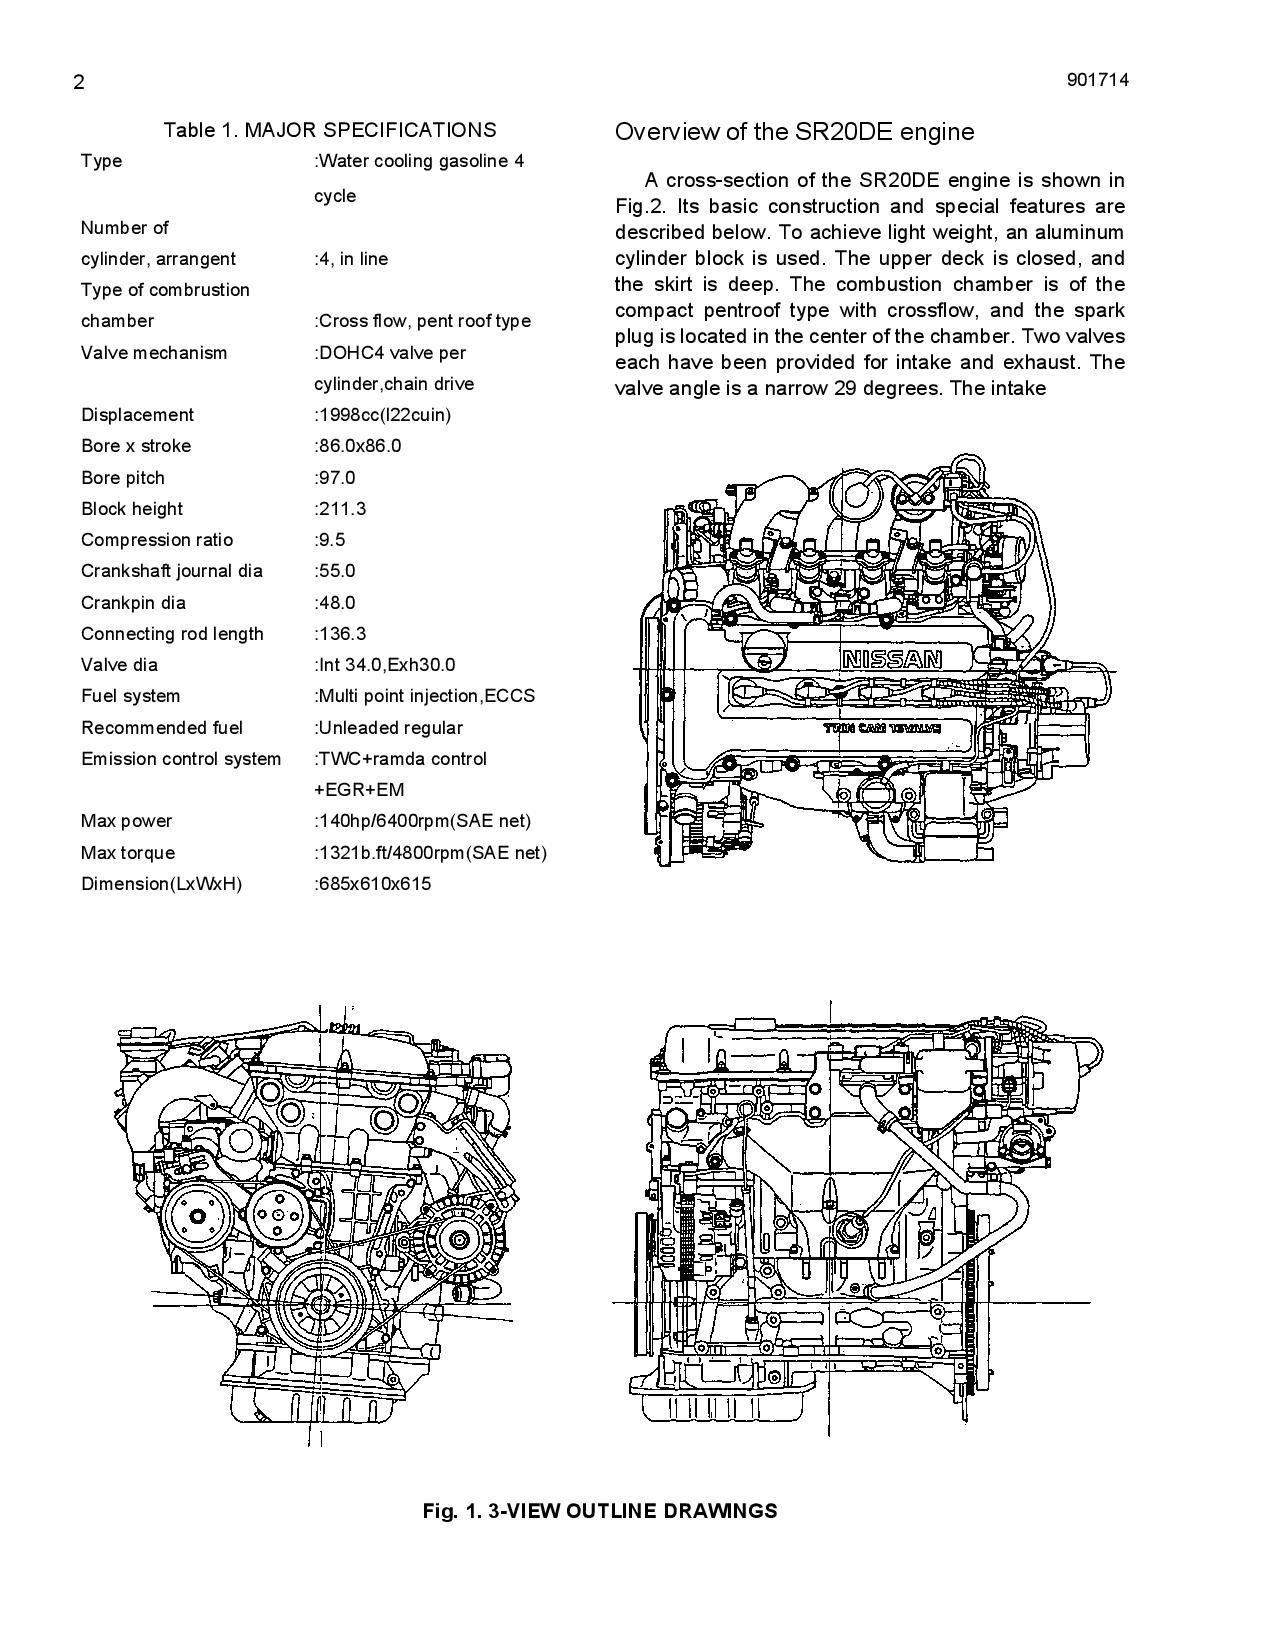 Sr20de Engine Diagram